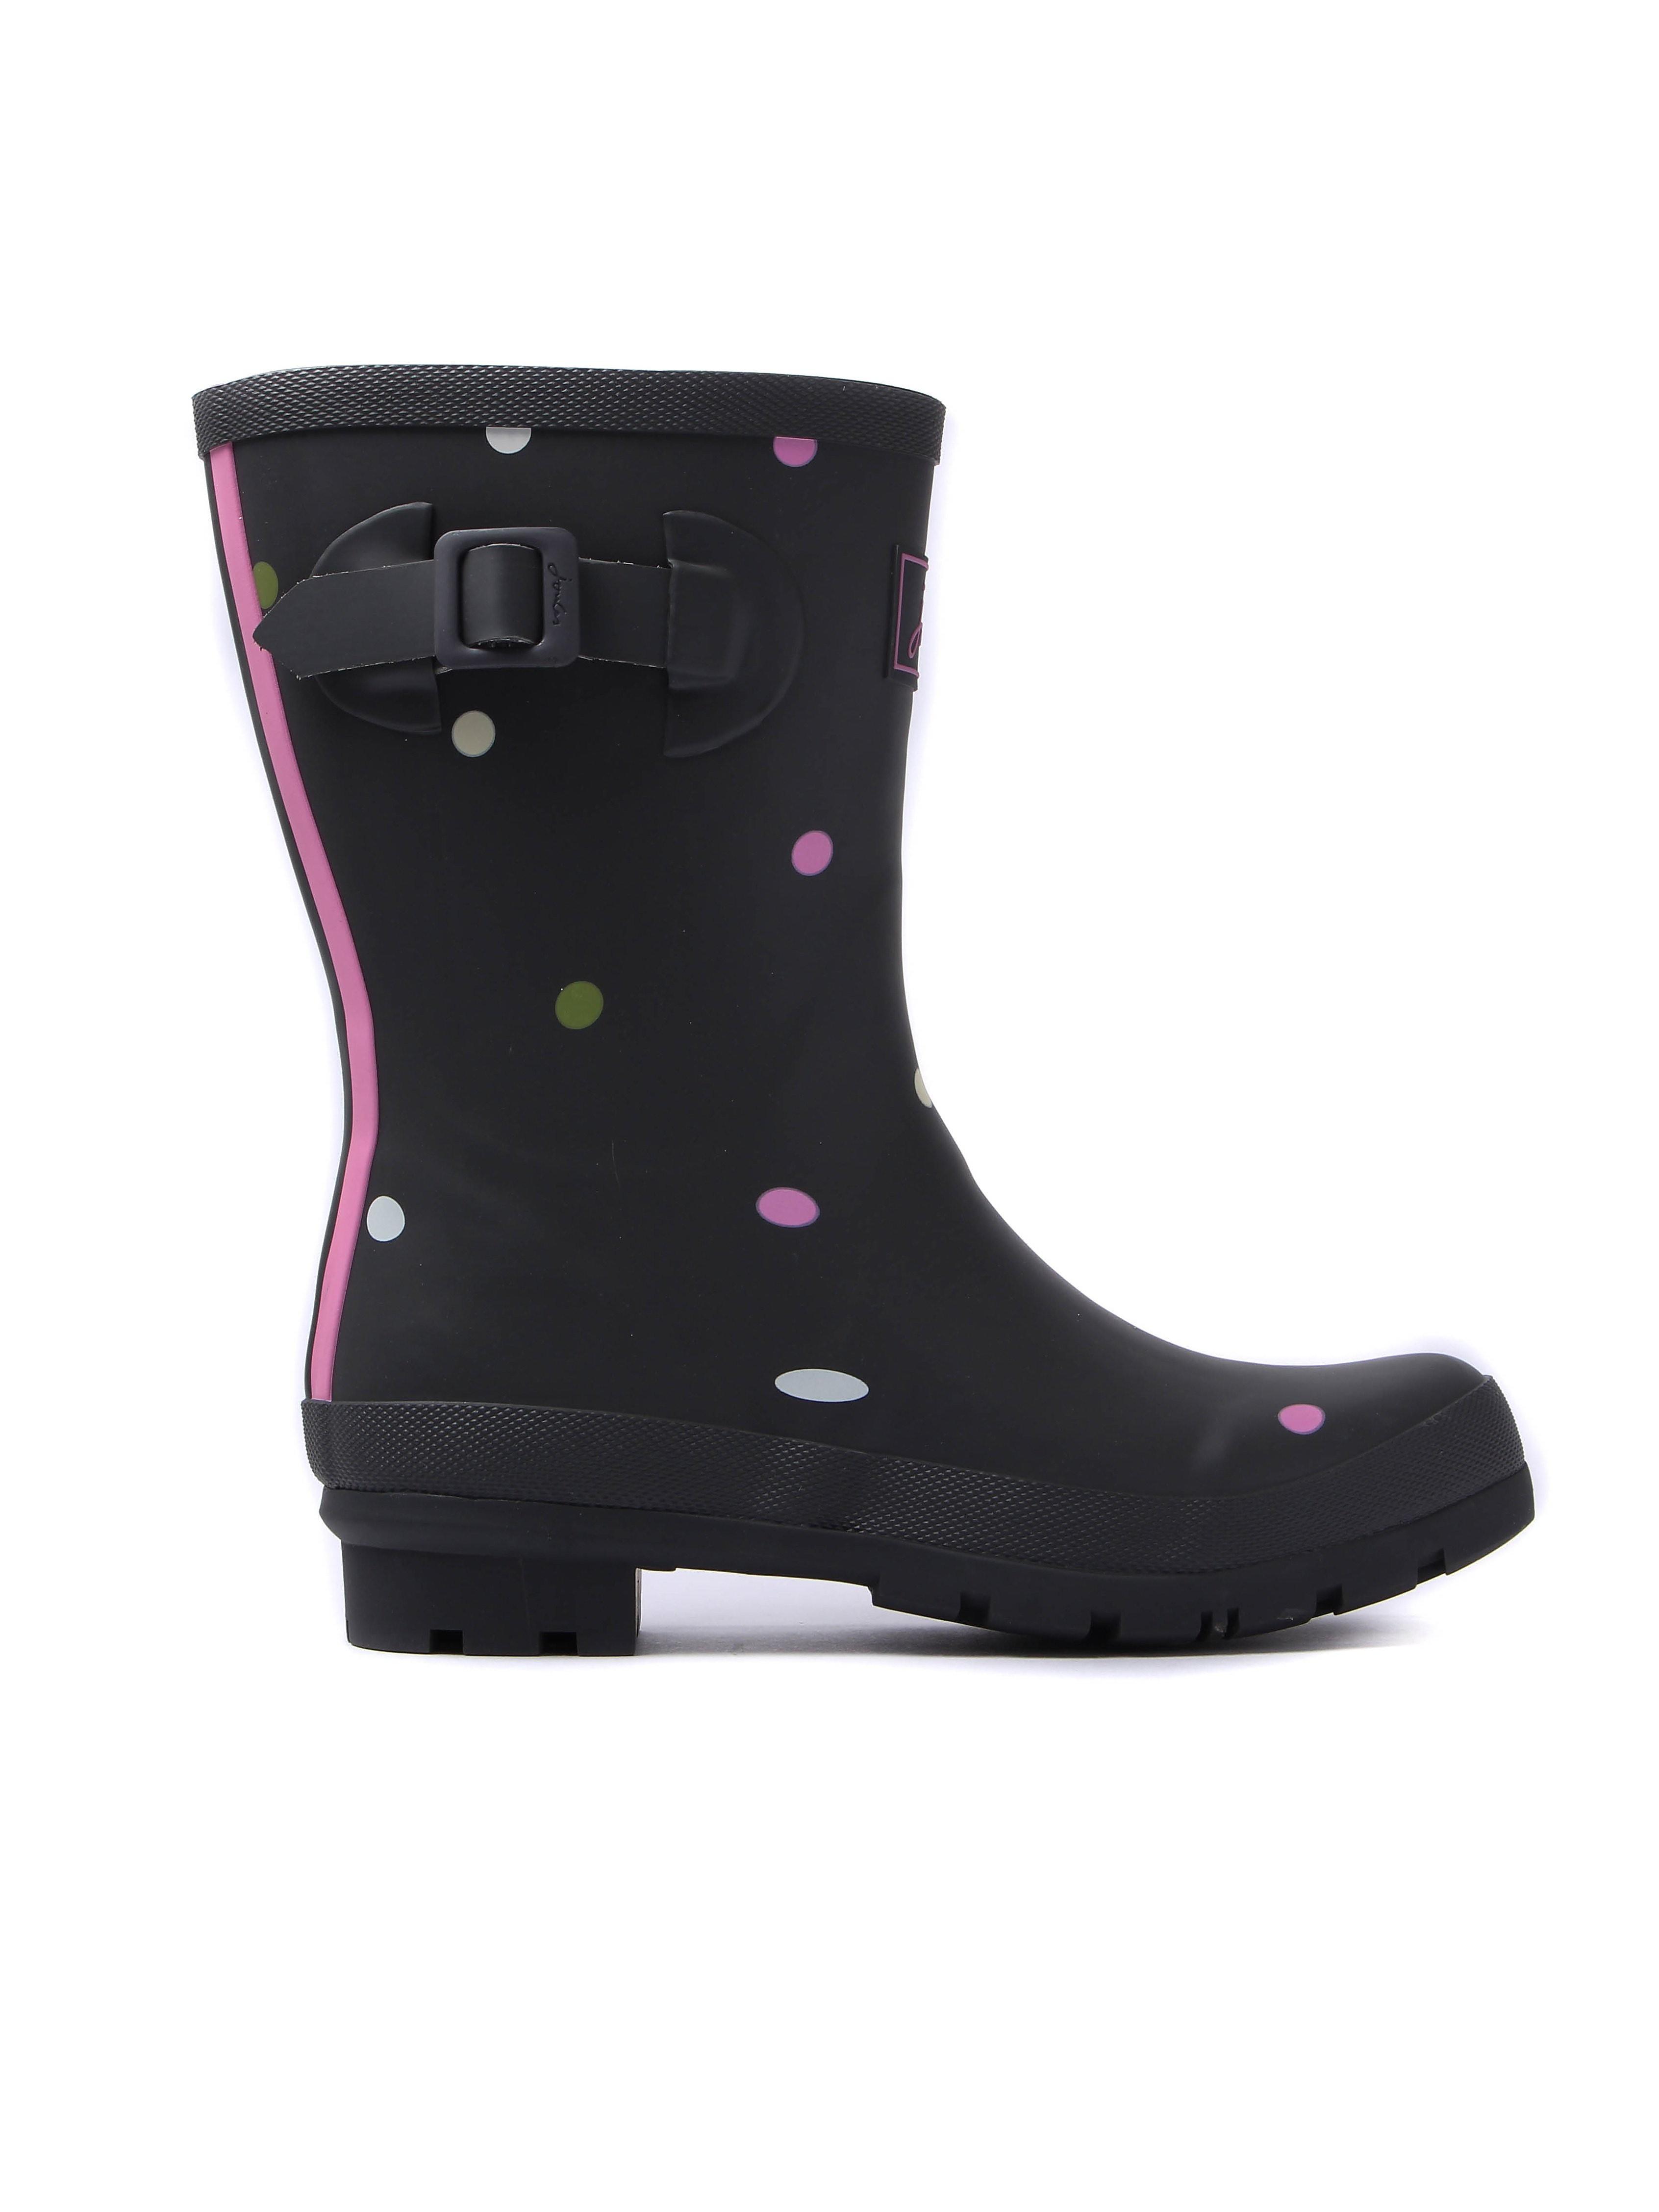 Joules Women's Molly Spot Rubber Mid-Height Wellington Boots - Grey Khaki